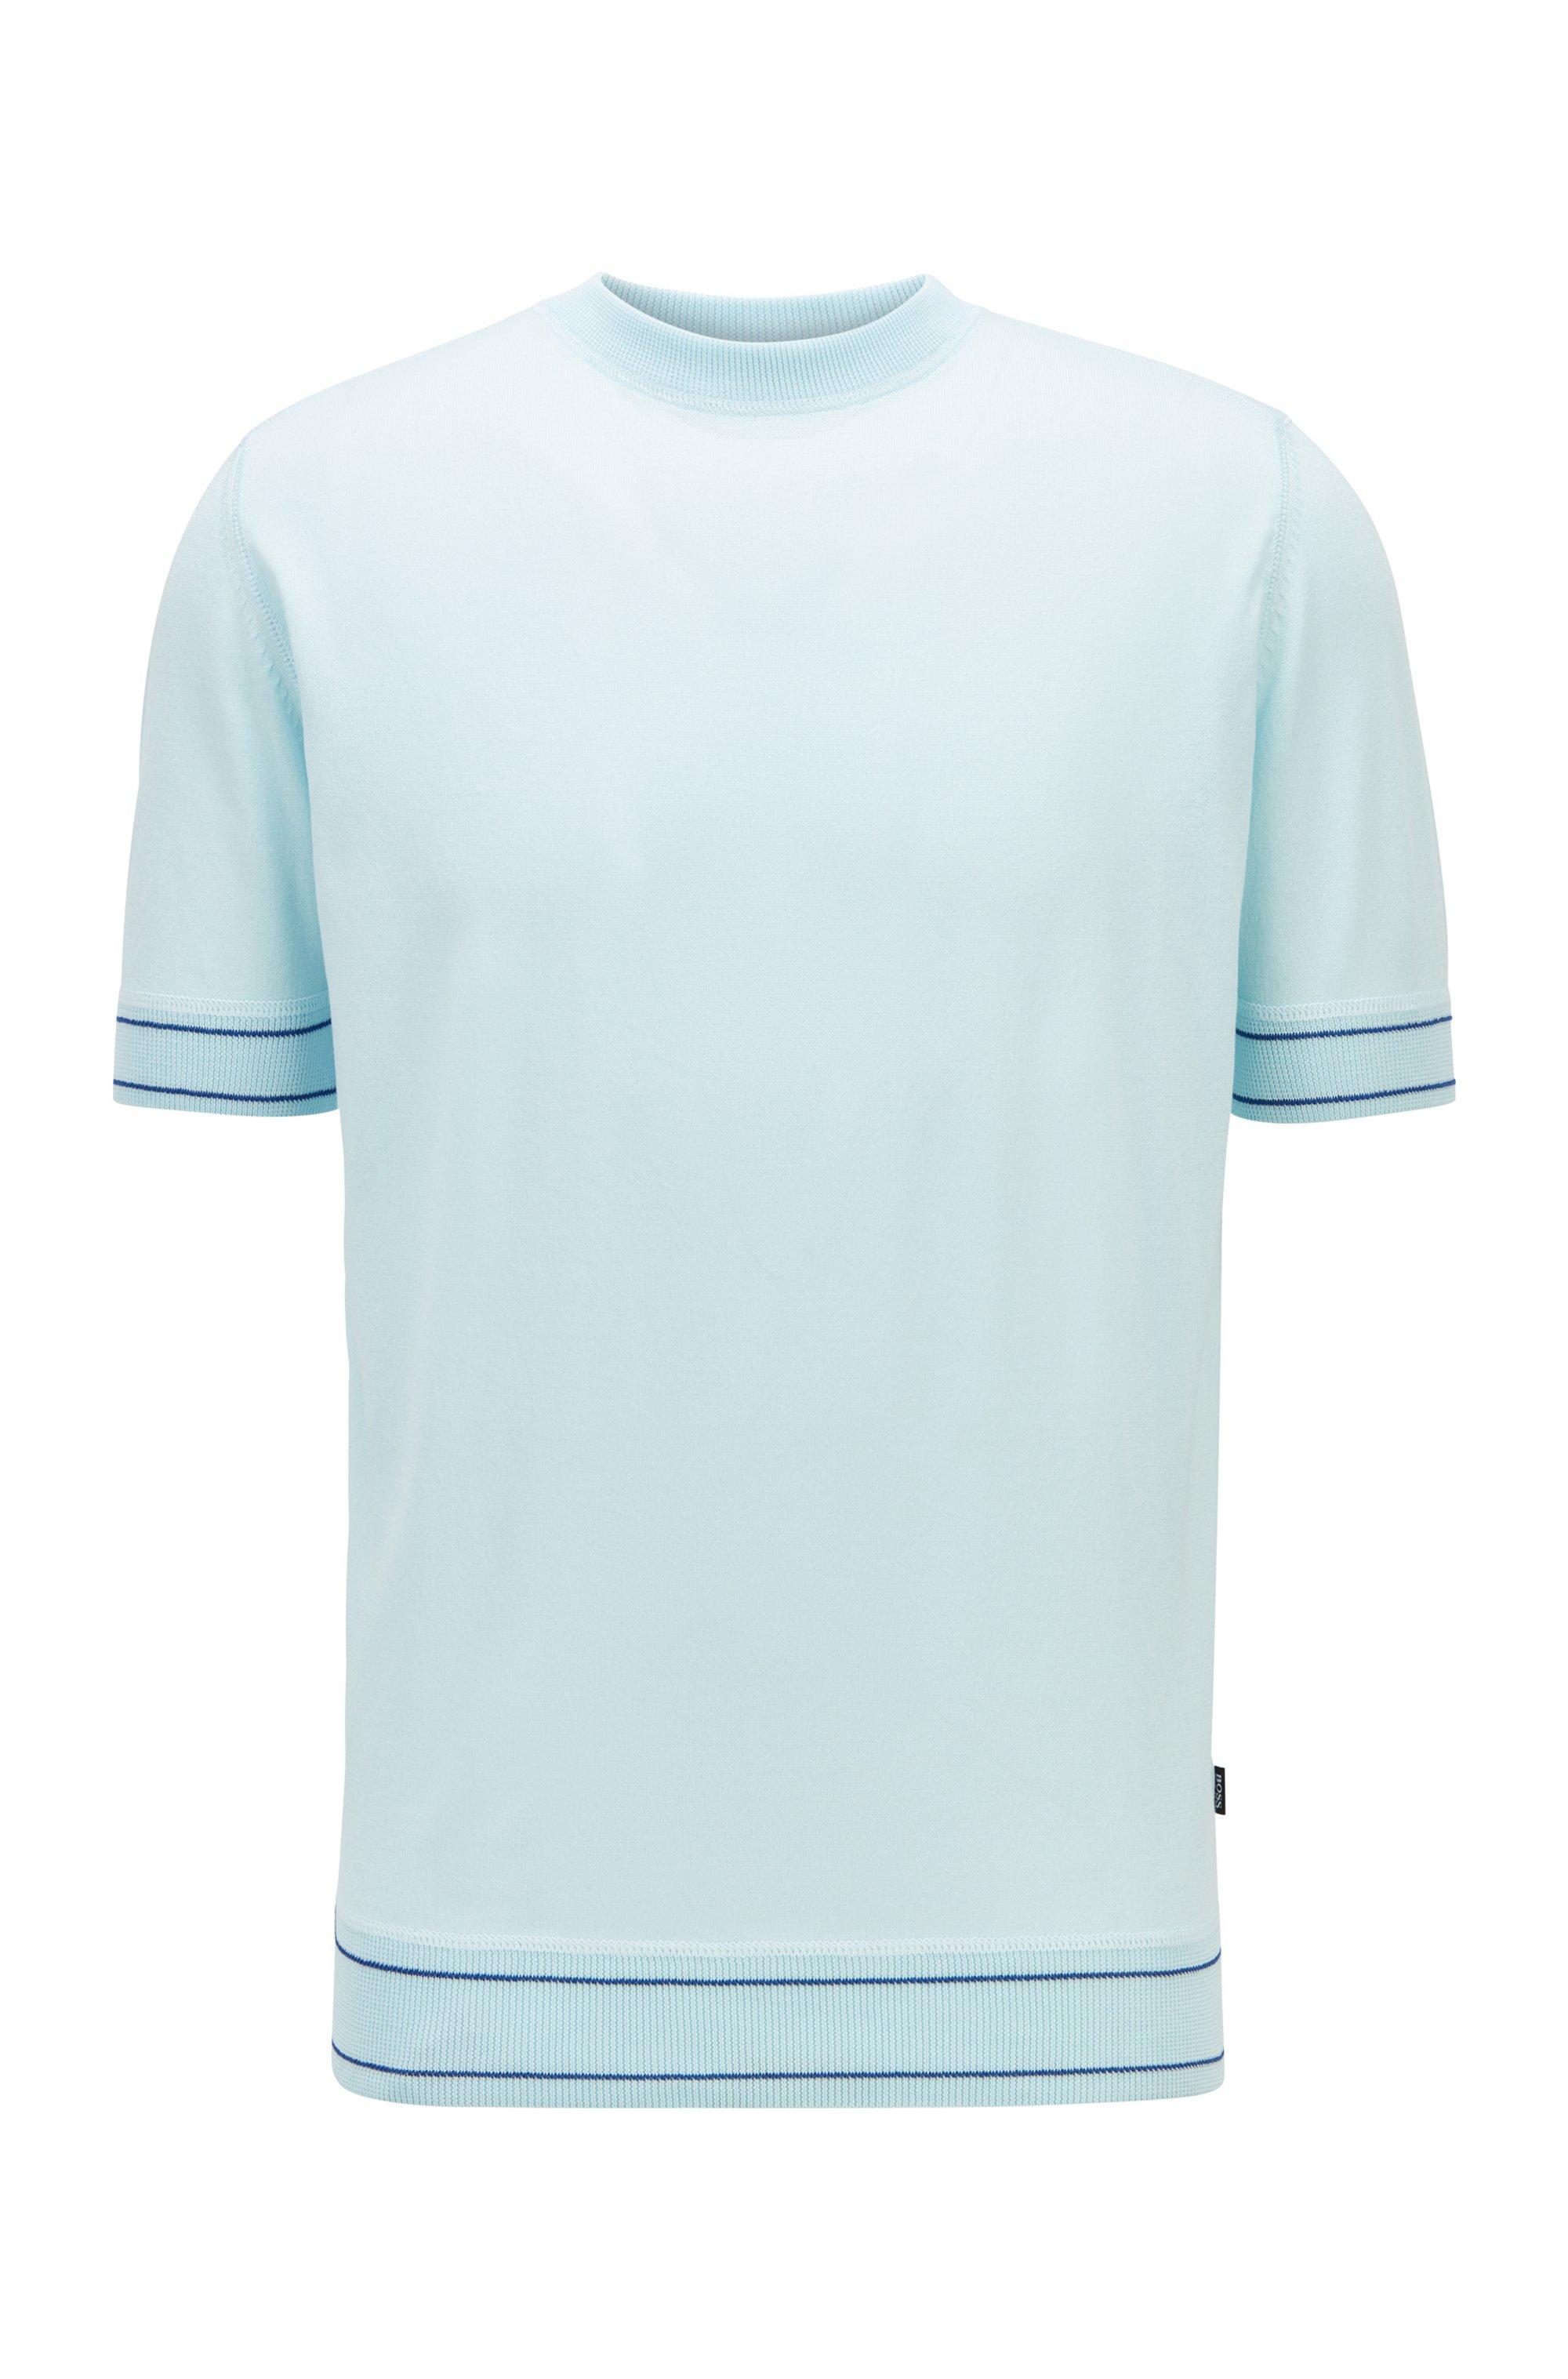 T-shirt-style sweater in mercerised cotton, Light Blue